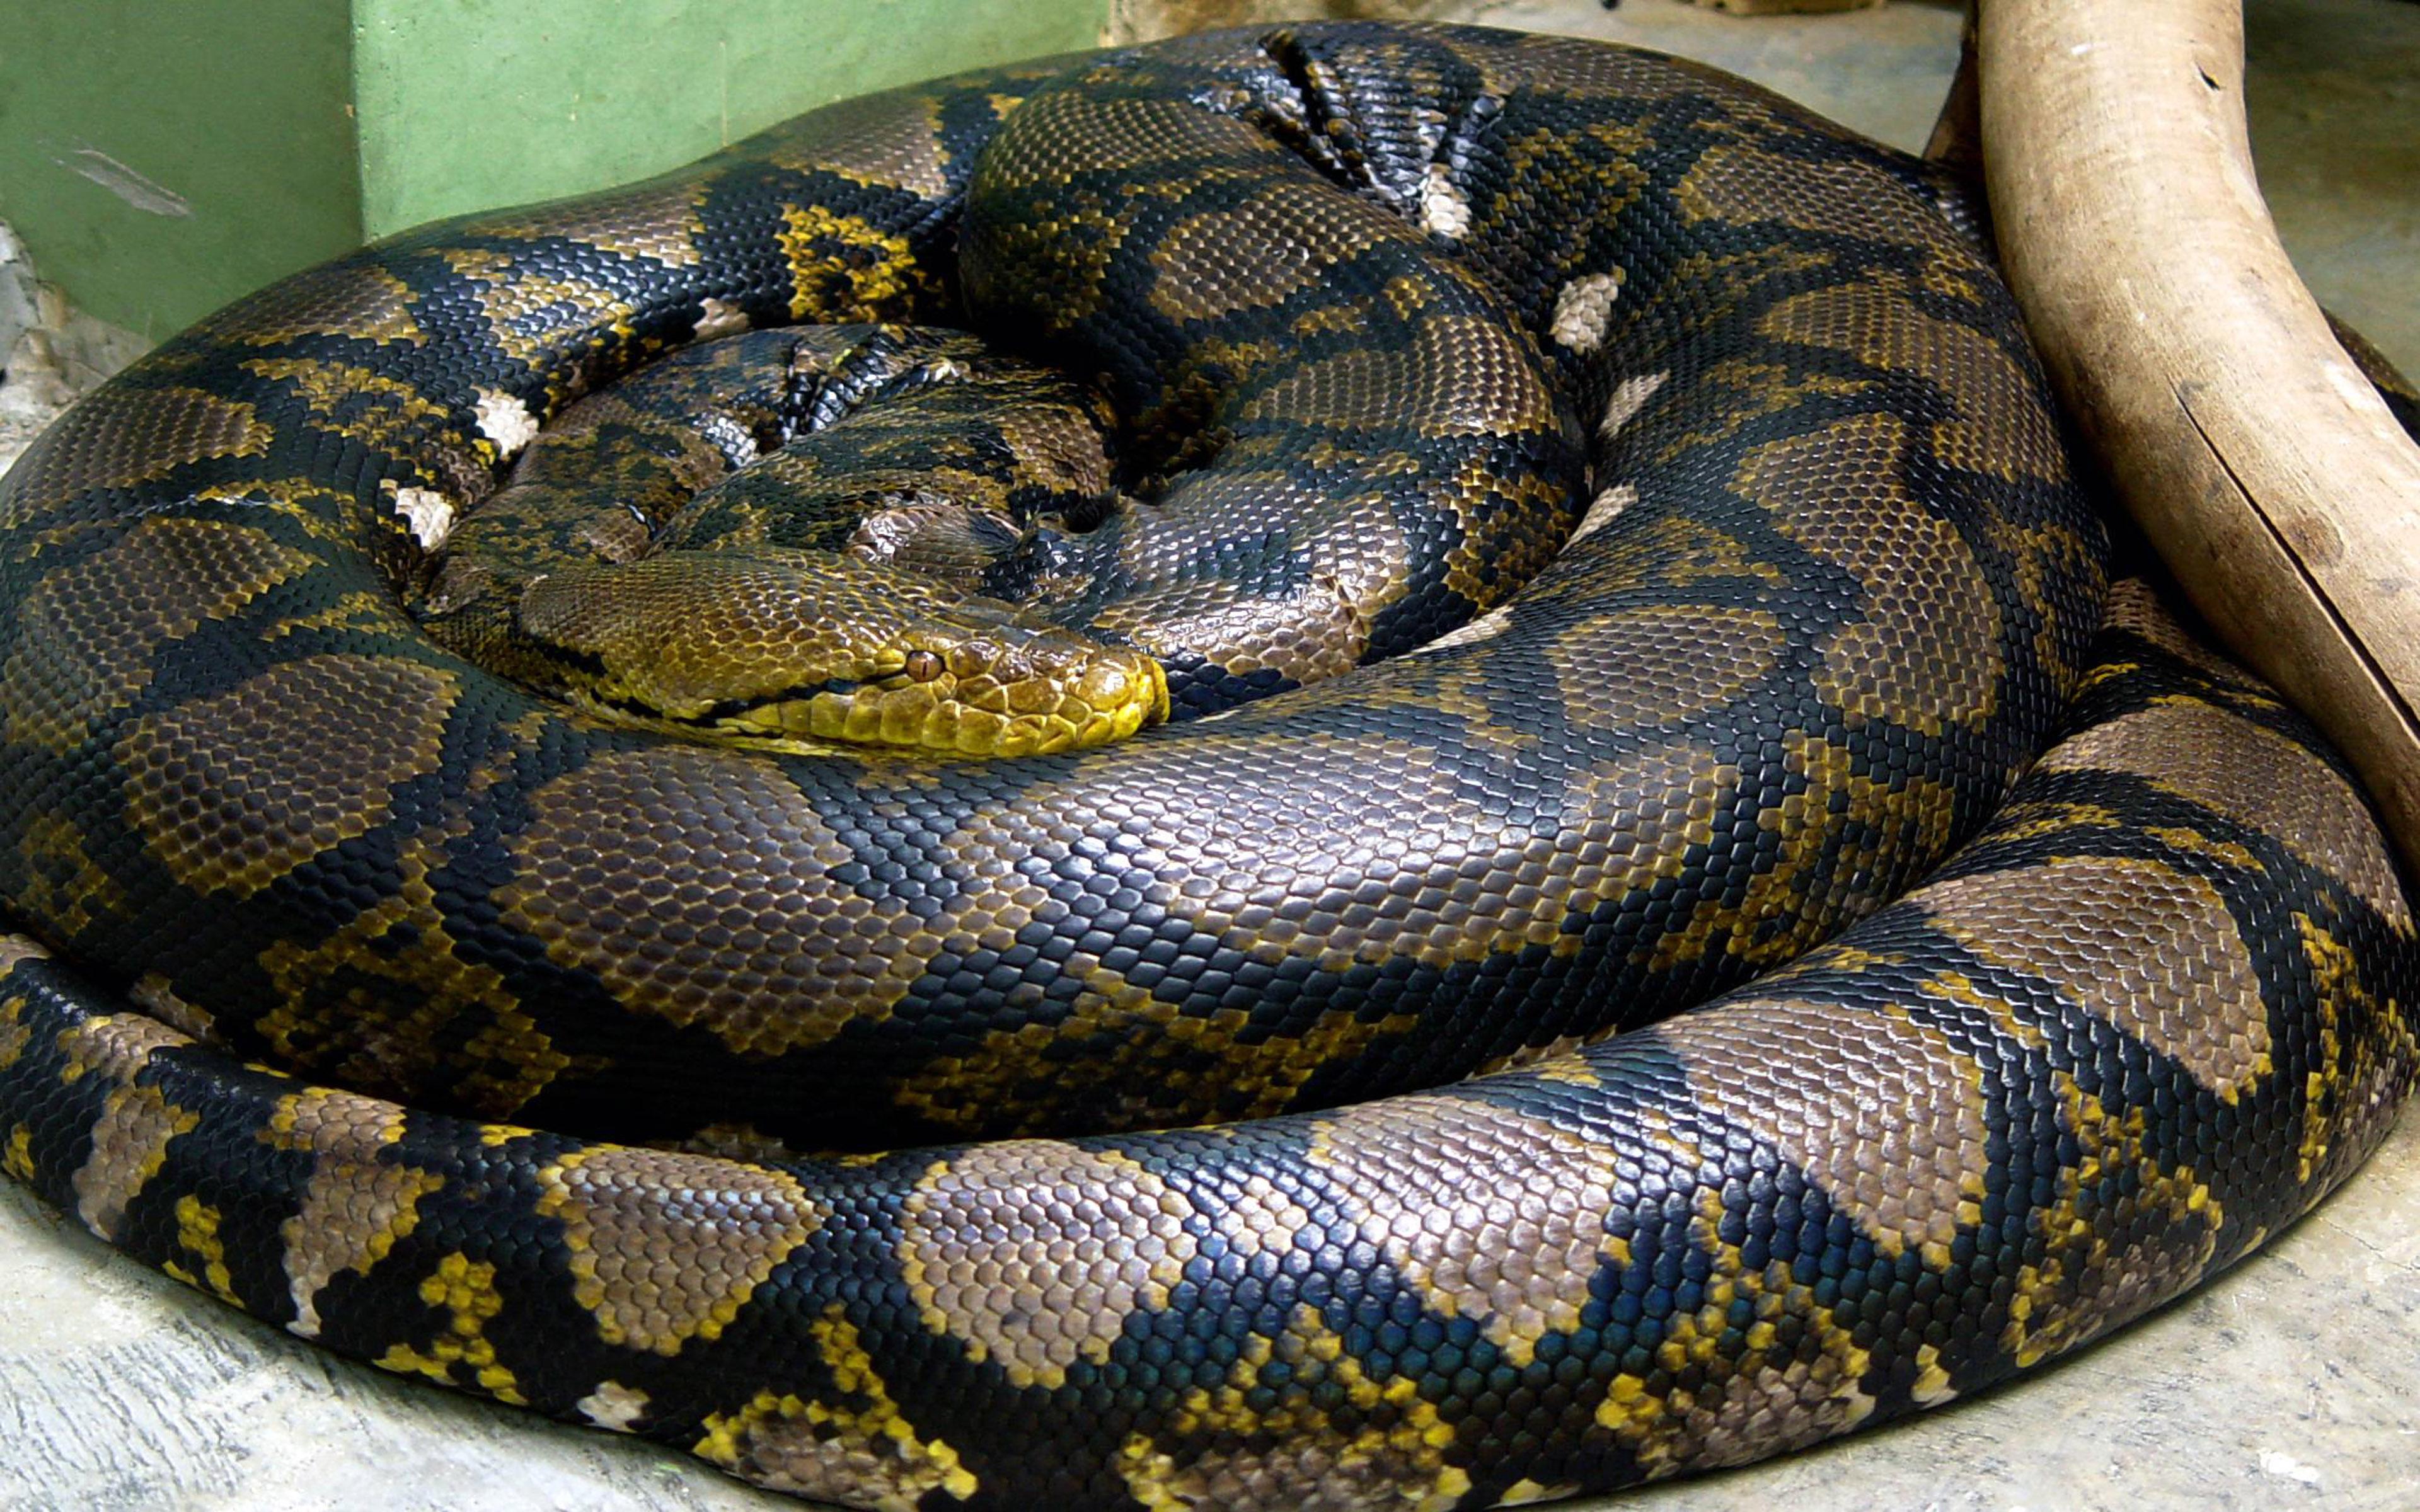 Cute Duck Hd Wallpaper Snake Circle Reptile Anaconda Animals Hd Wallpaper